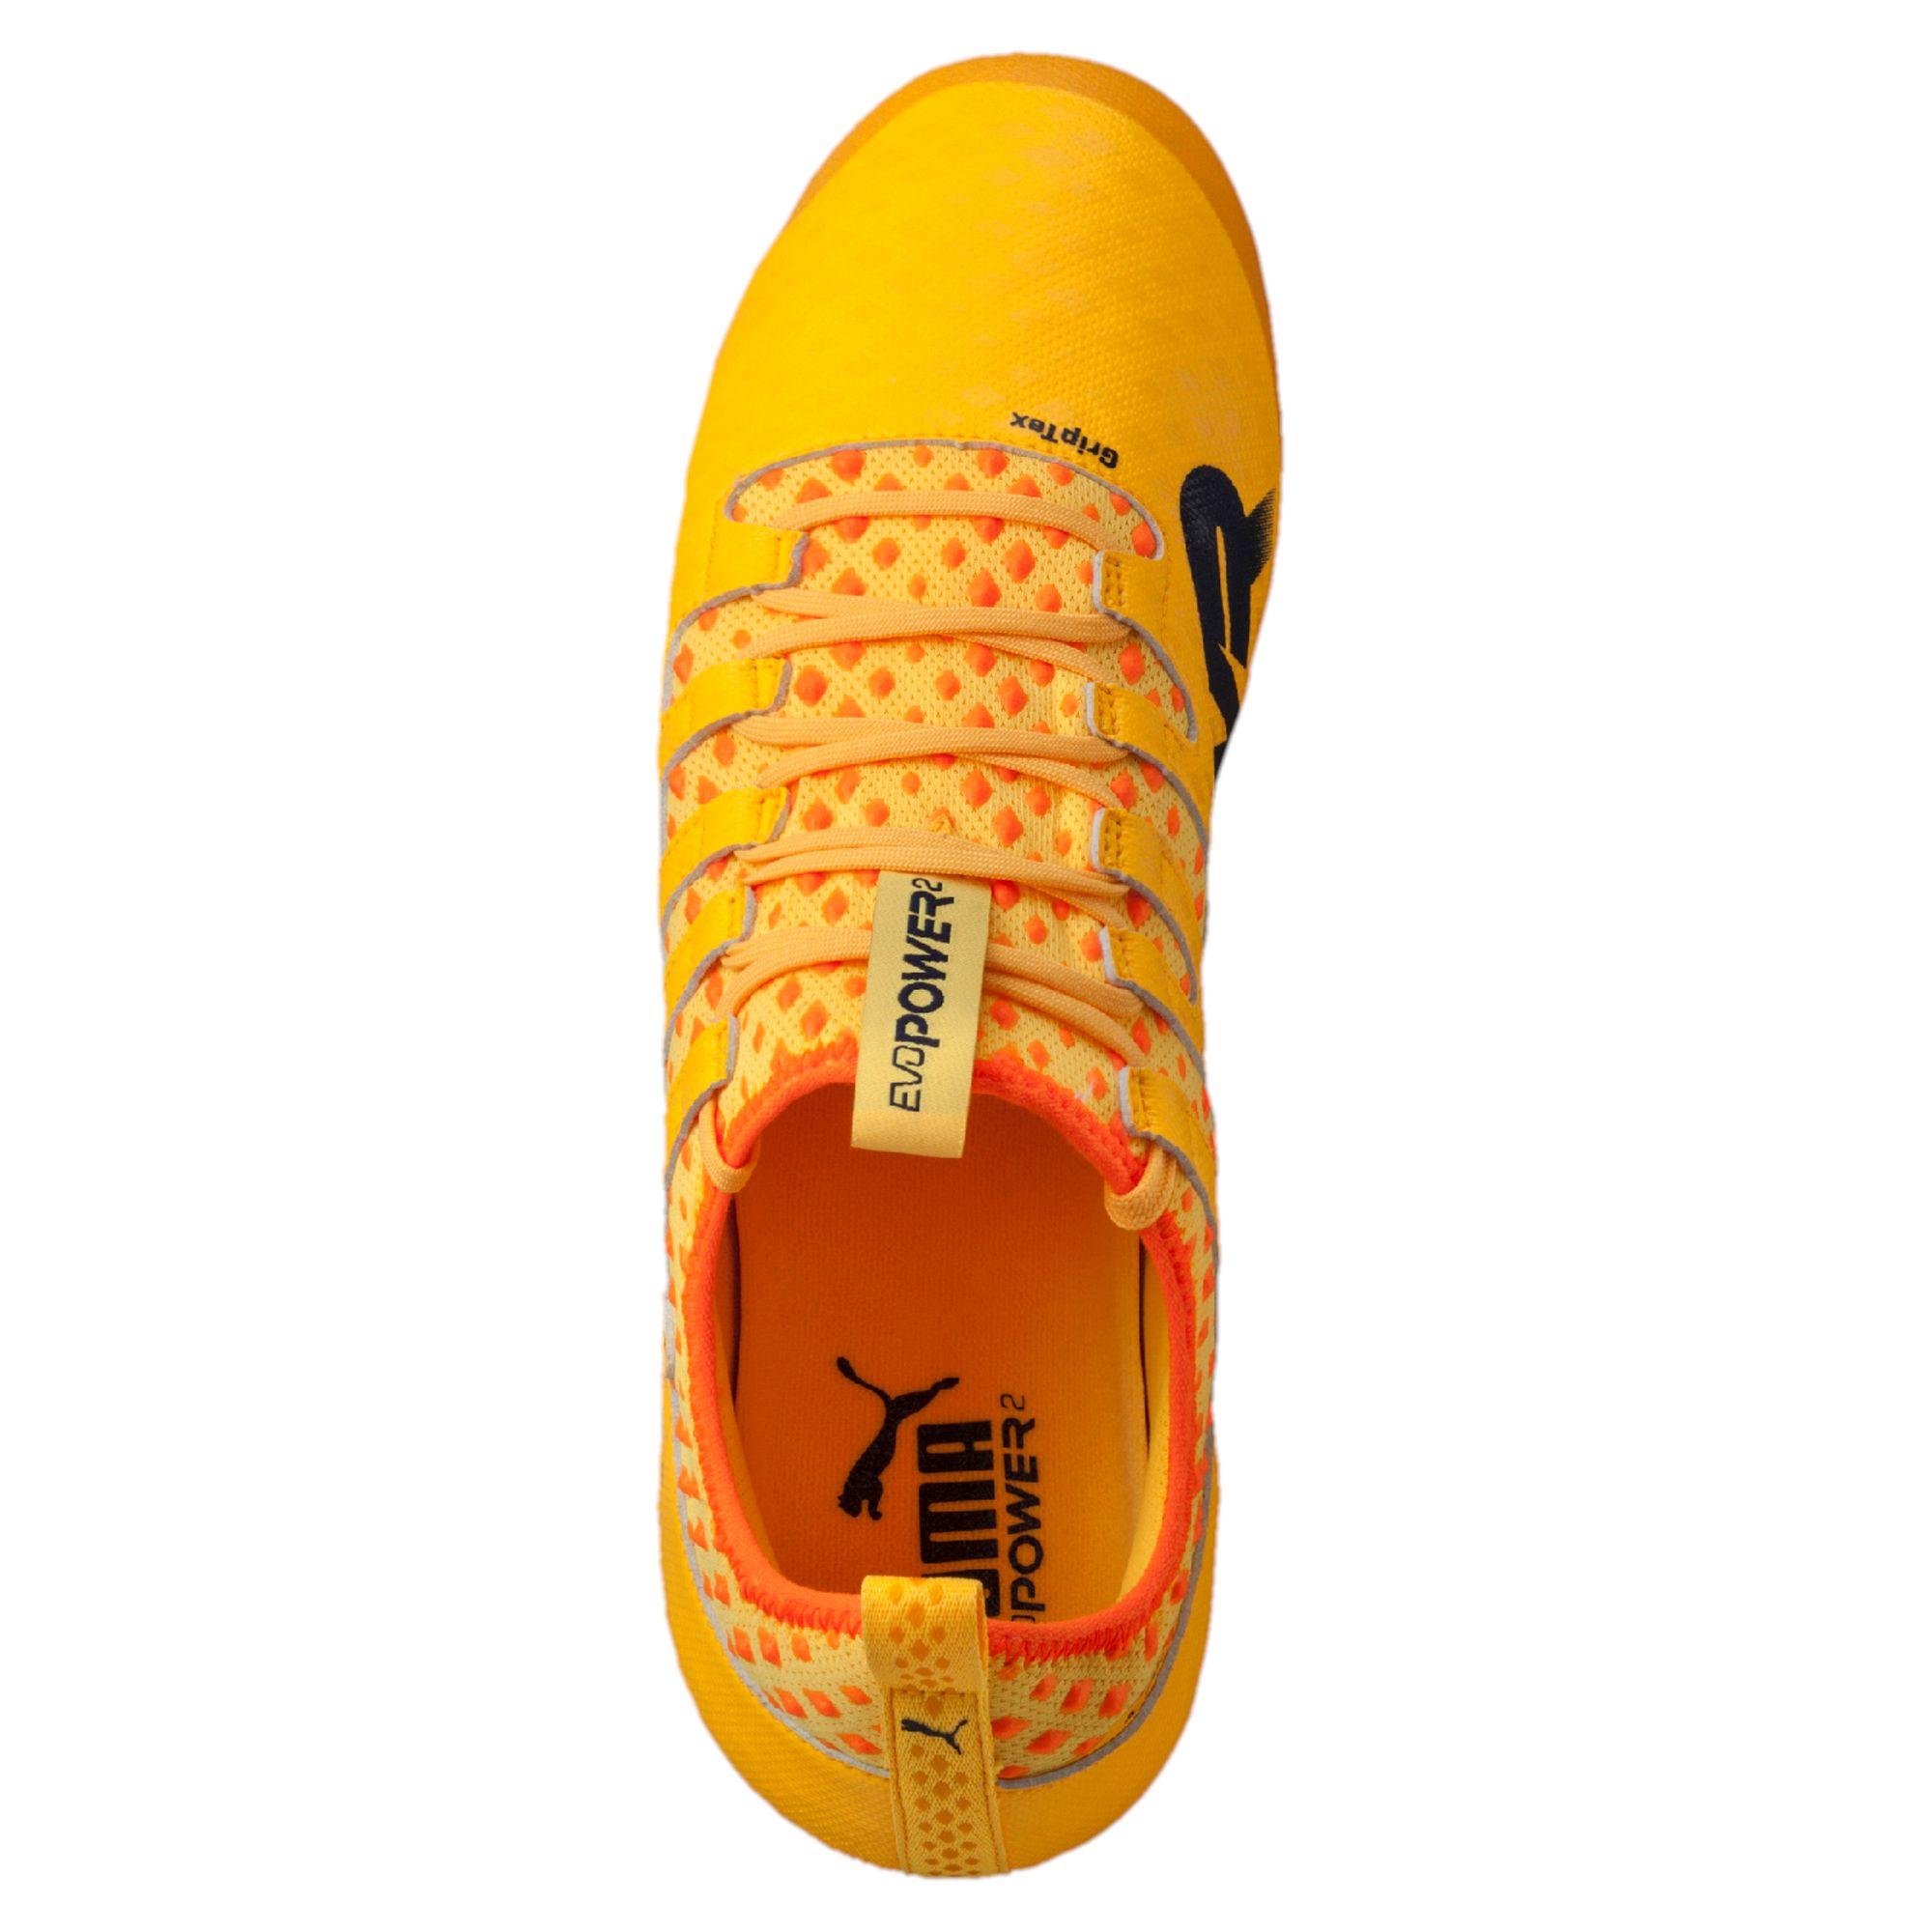 PUMA-evoPOWER-Vigor-2-AG-Men-s-Football-Boots-Hombre-Zapatos-Futbol-Nuevo miniatura 11